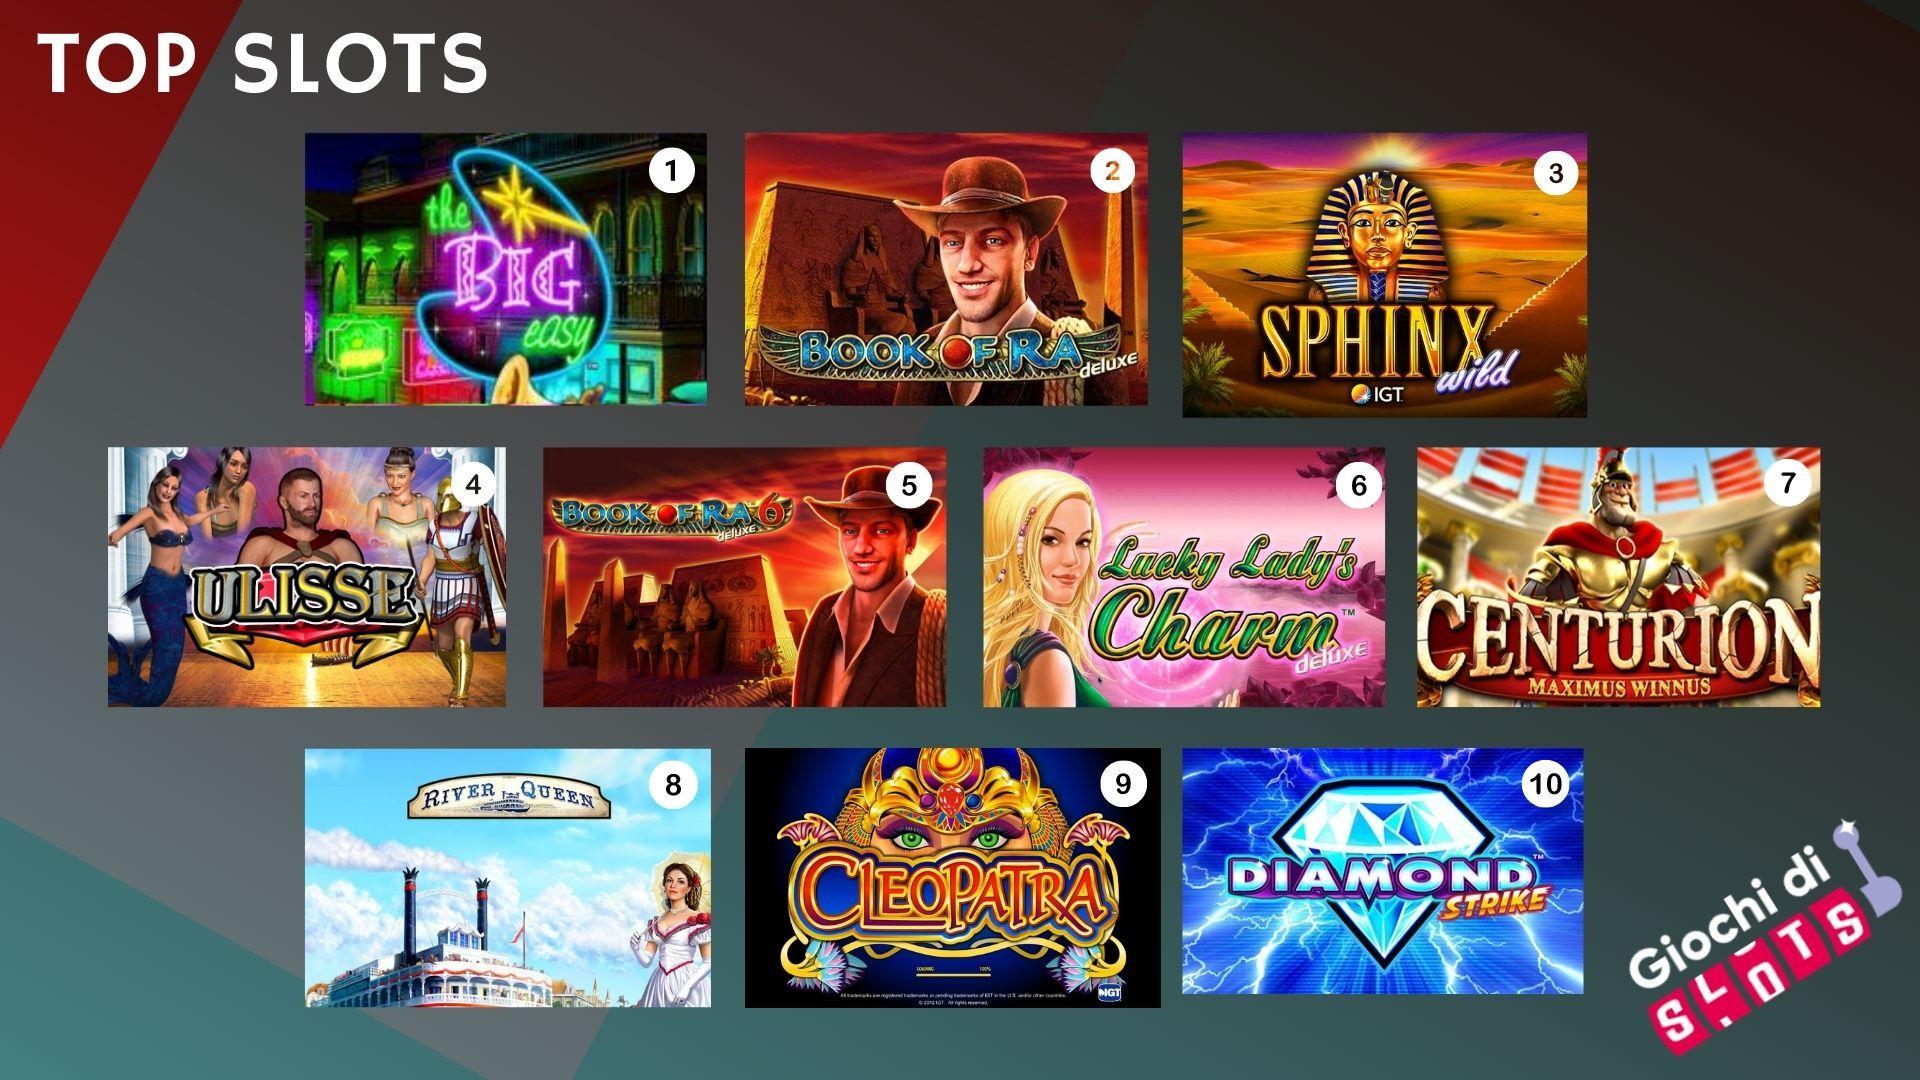 Top 10 Slot Gds